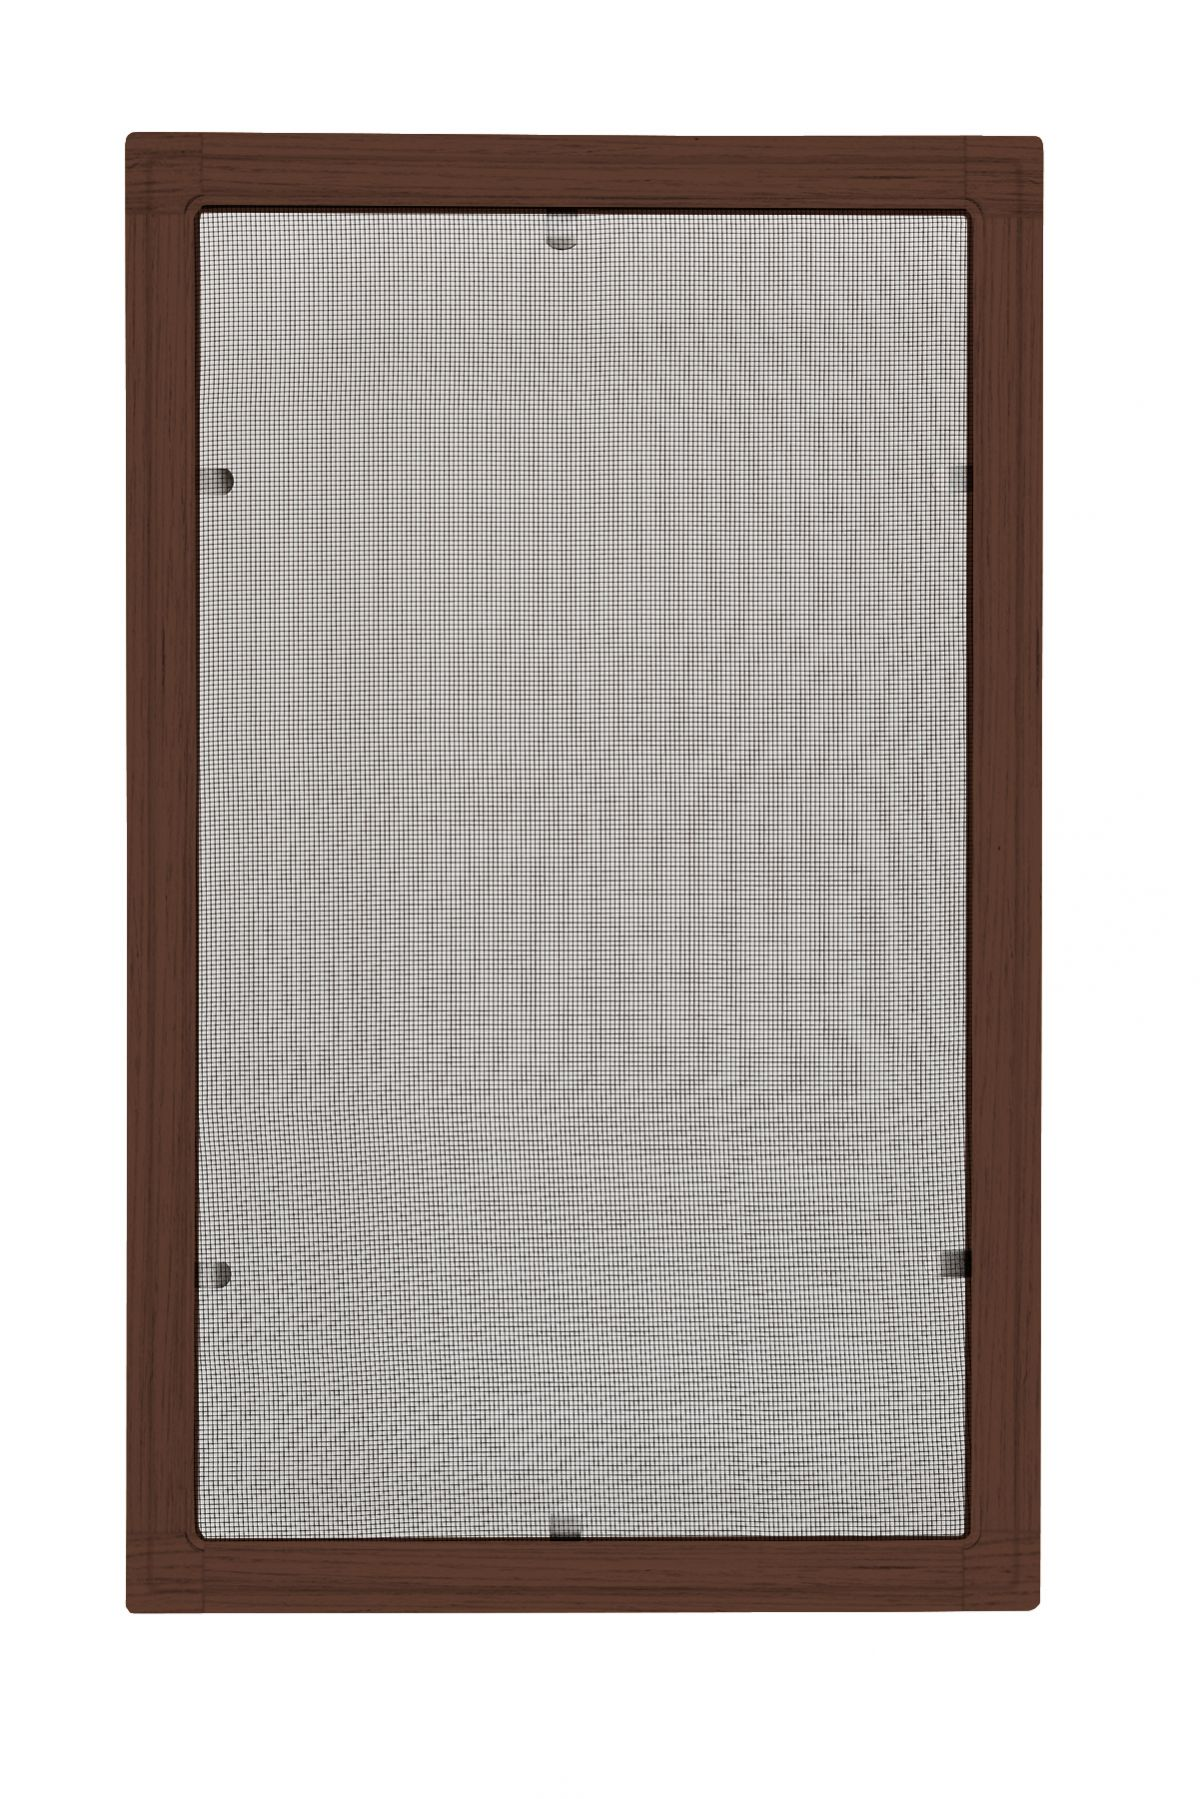 Moskitiery okienne Moskitiera ramkowa - mahoń, siatka szara